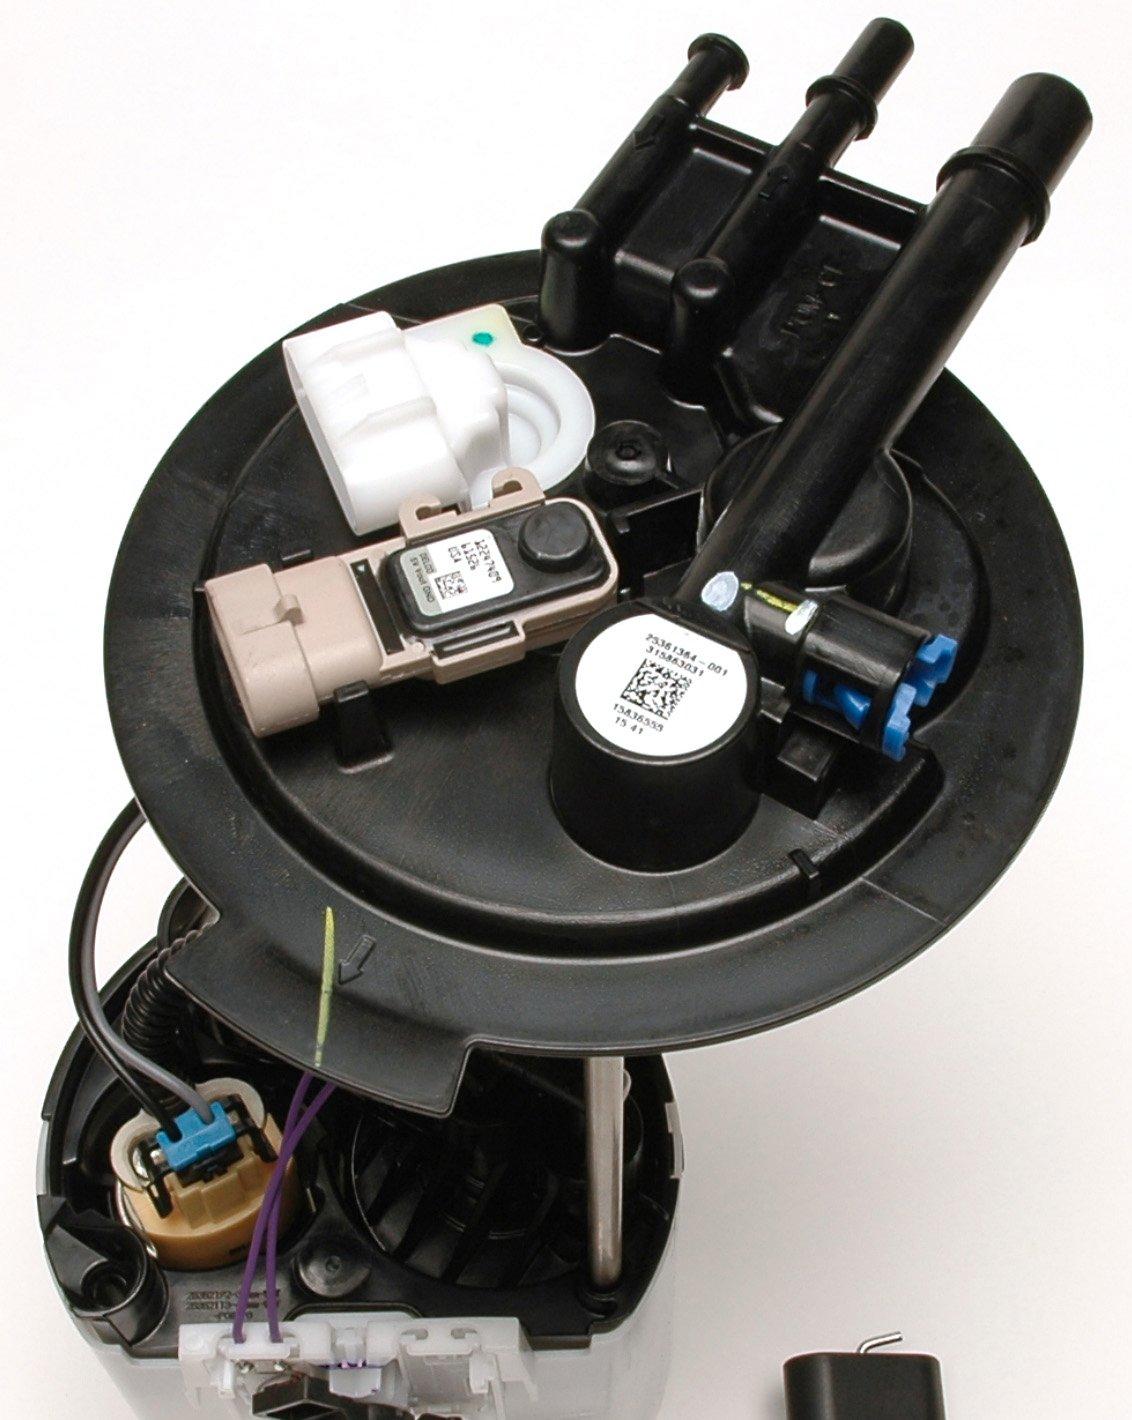 Delphi FG0409 Fuel Pump Module